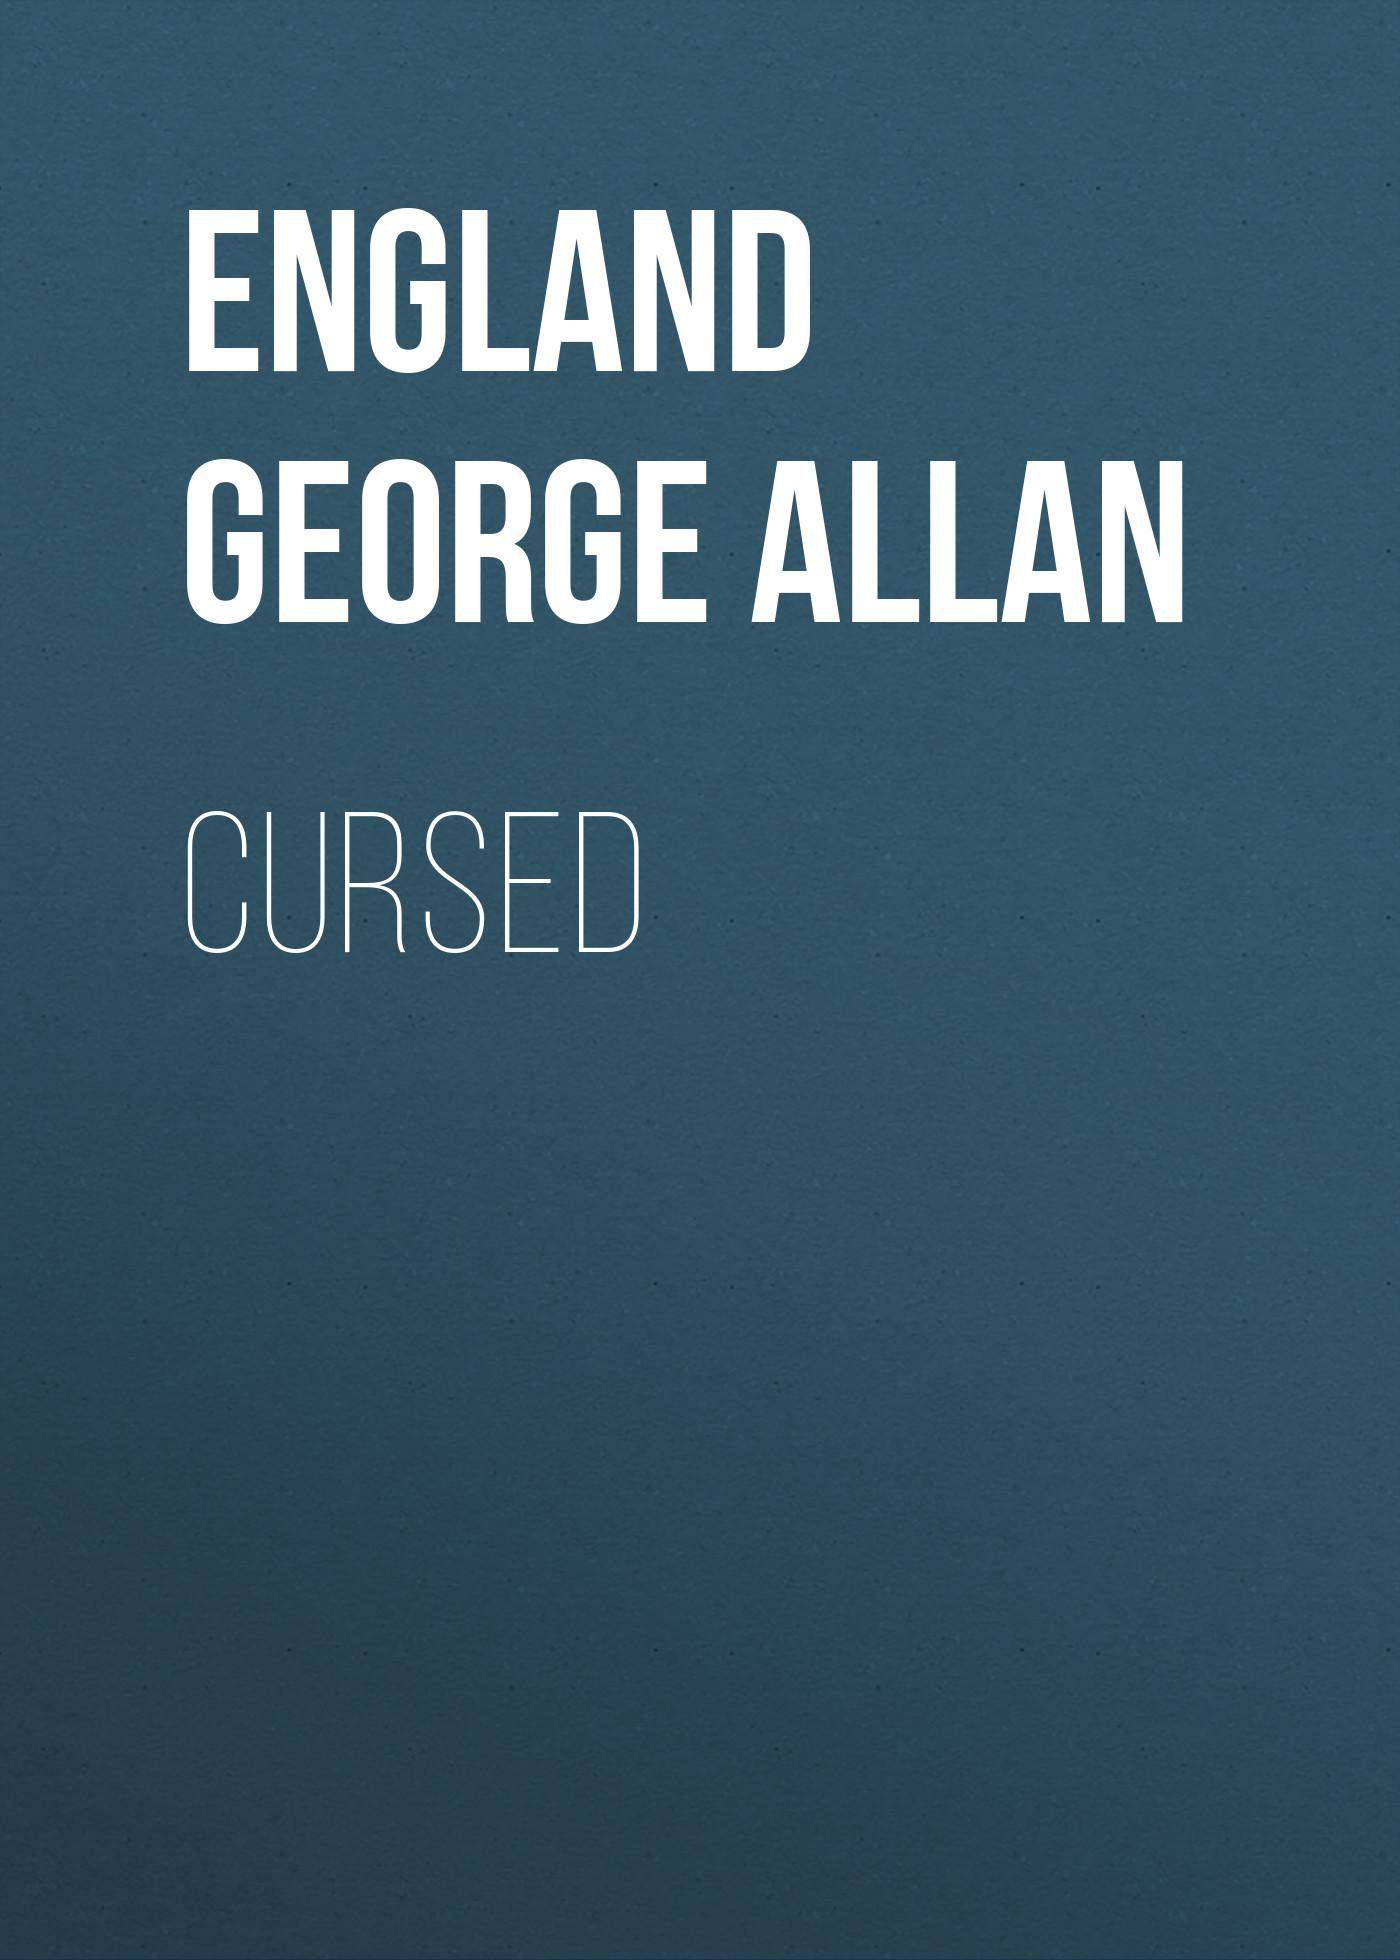 England George Allan Cursed star cursed